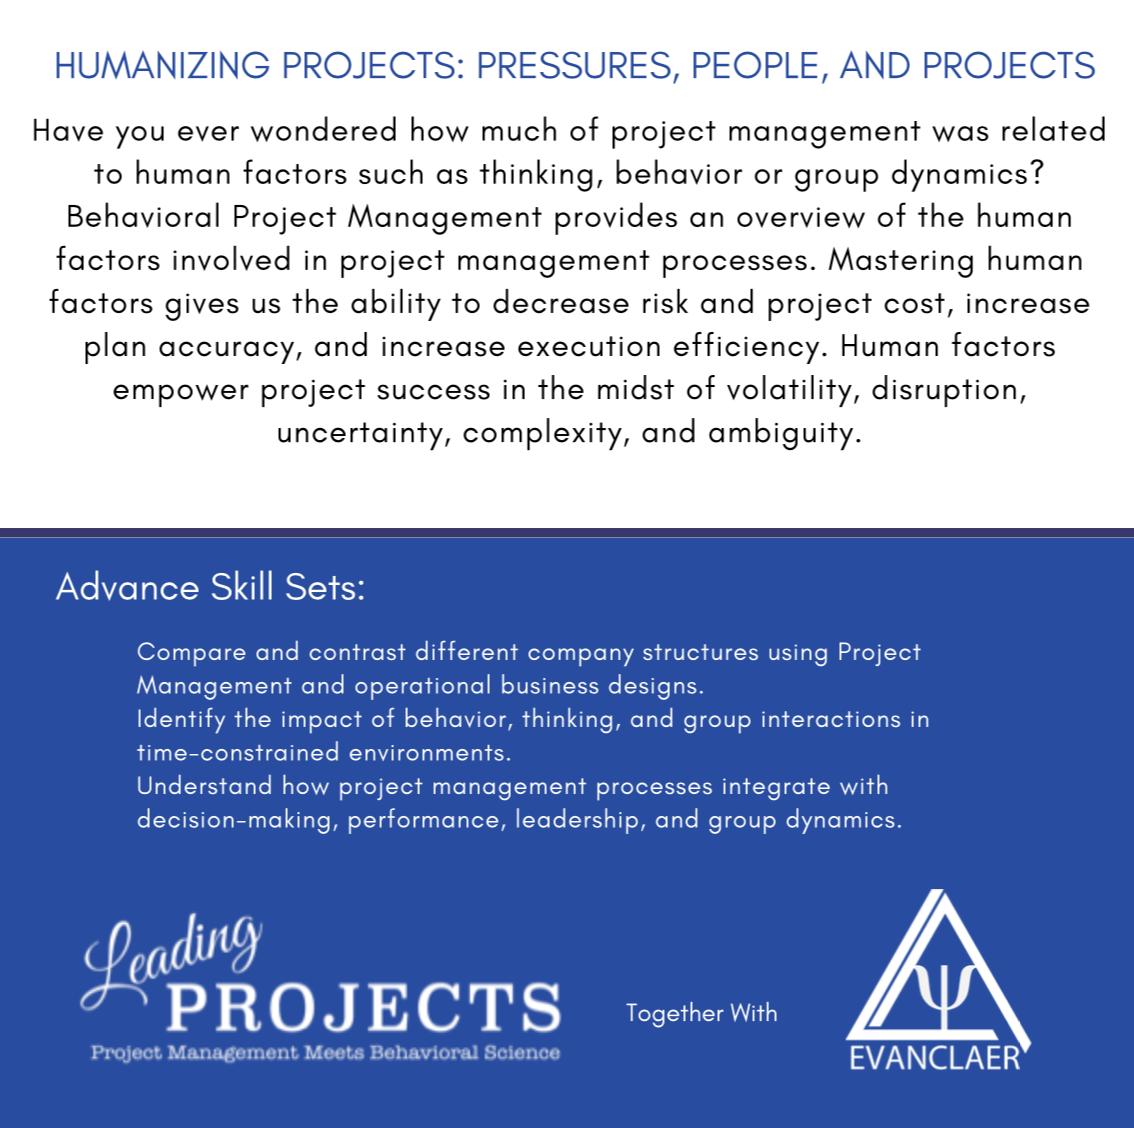 Humanizing Projects Description